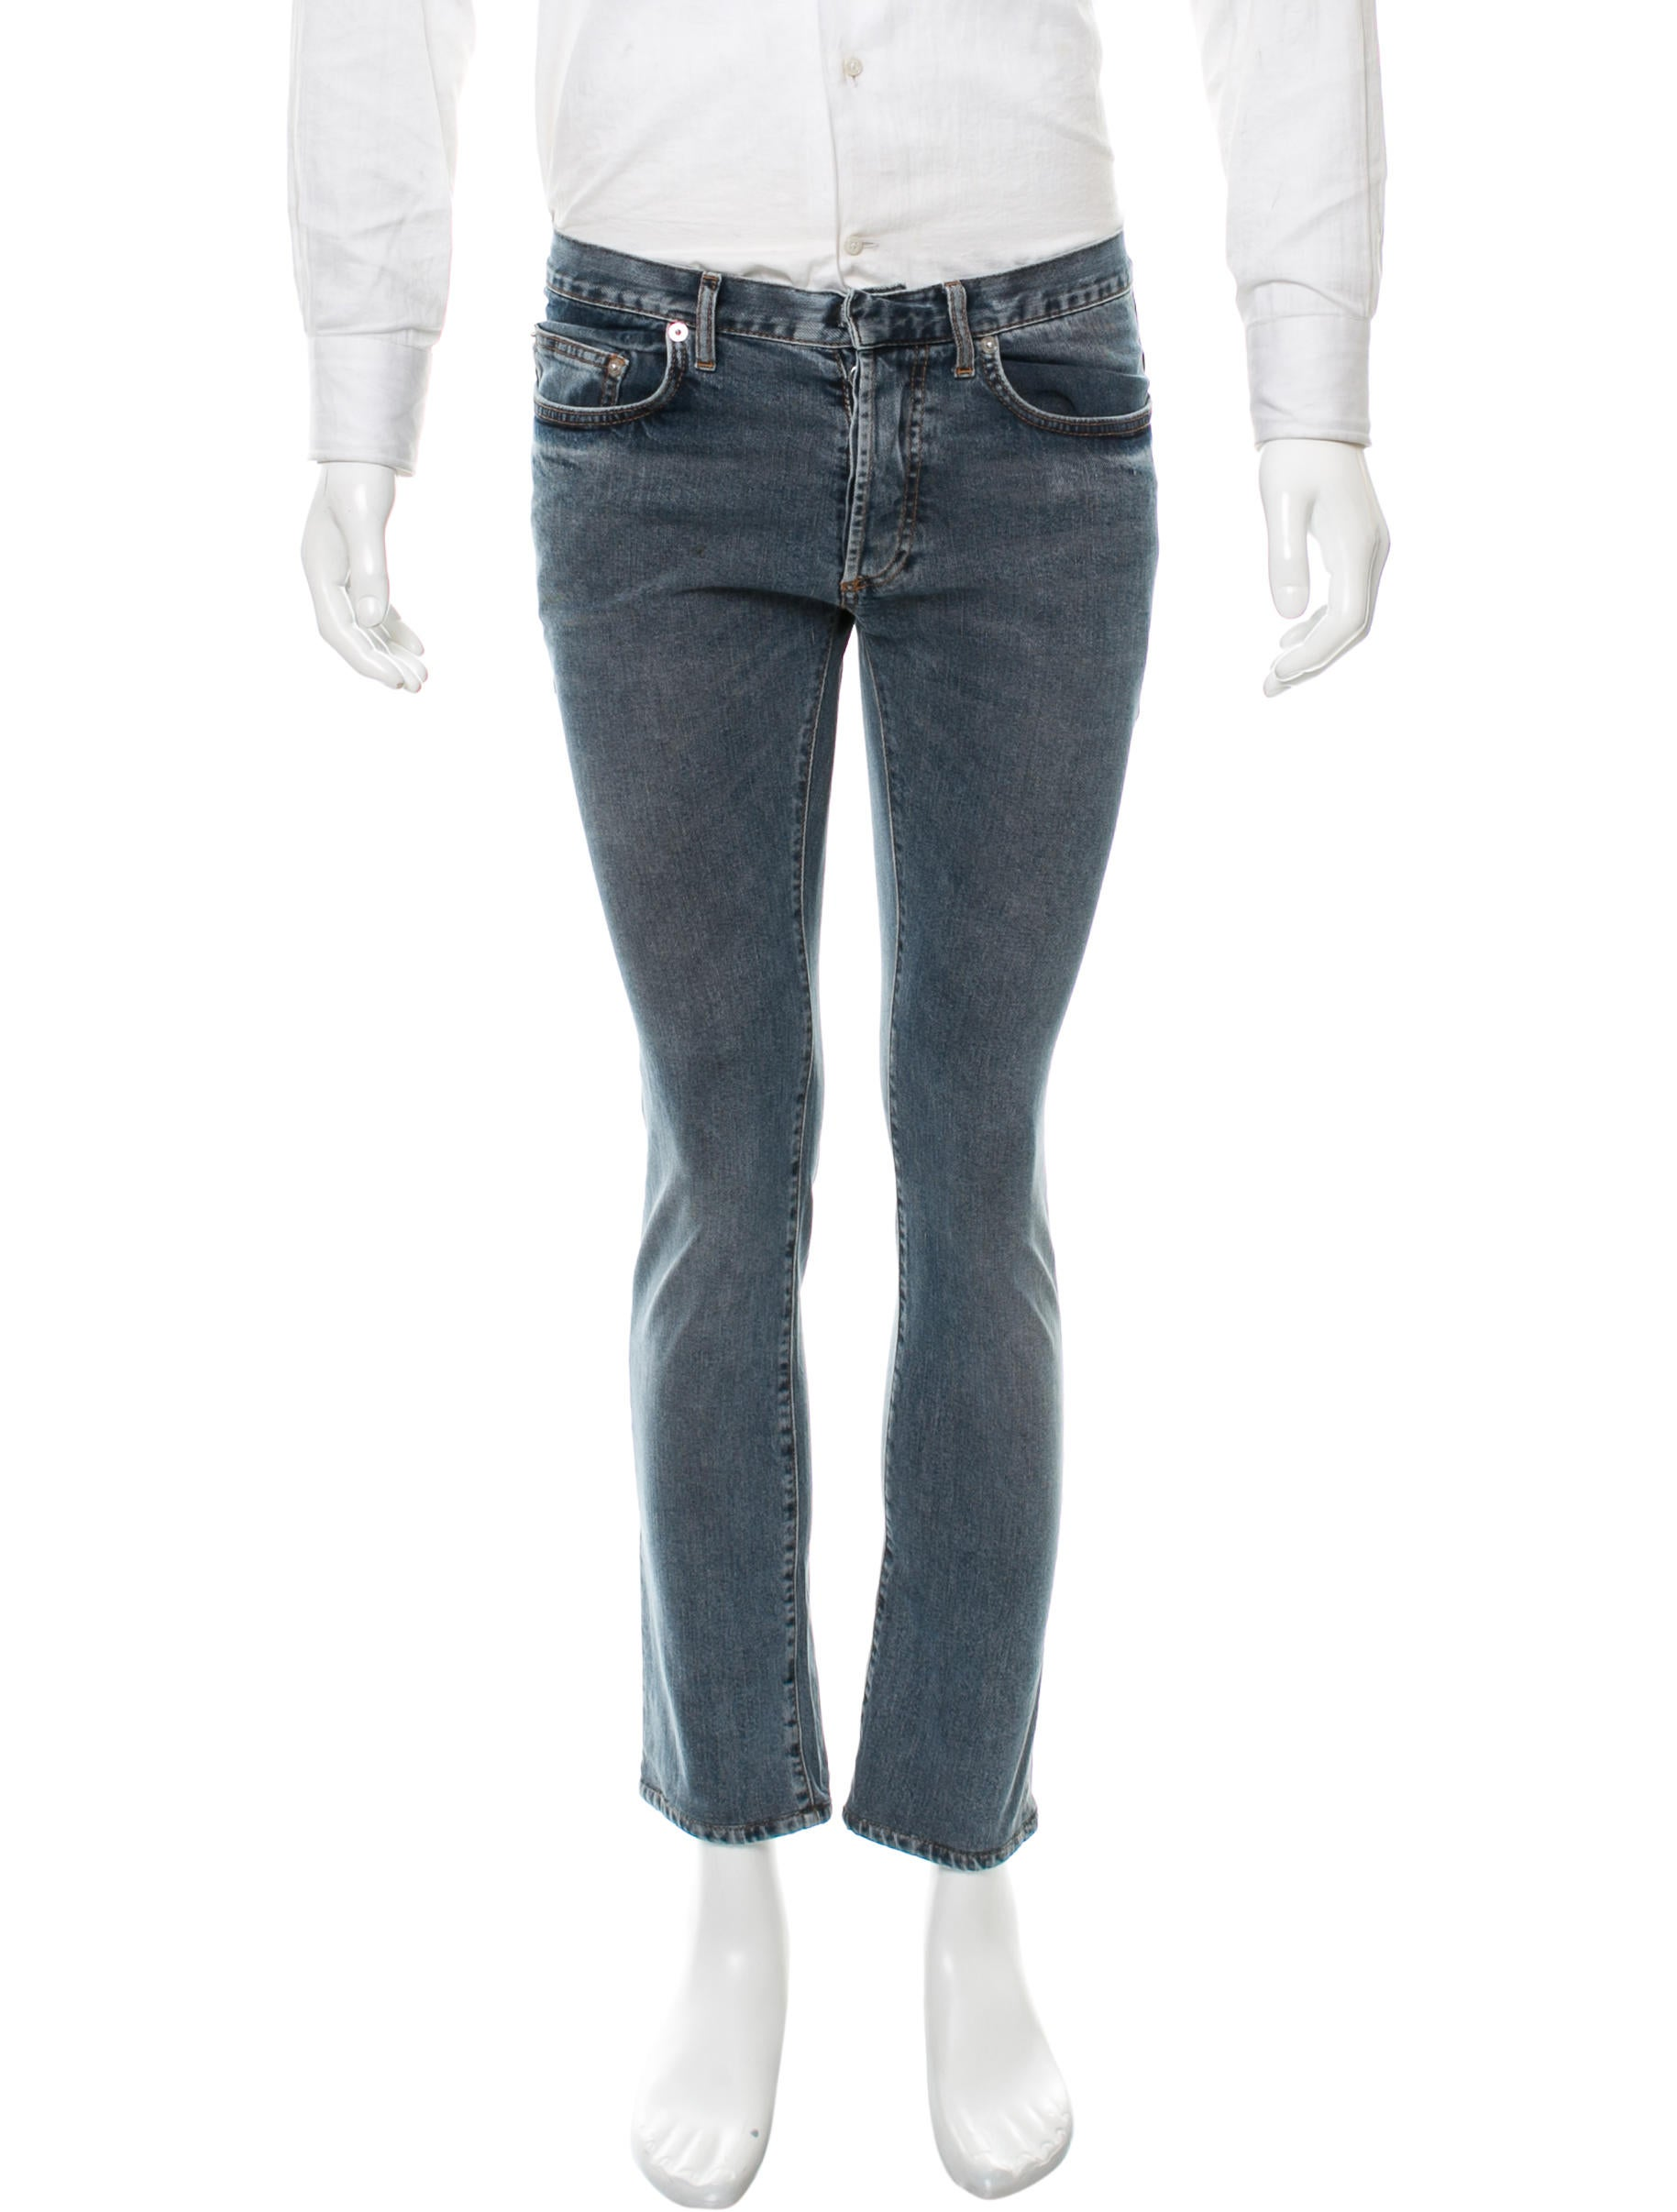 dior homme skinny jeans clothing hmm22889 the realreal. Black Bedroom Furniture Sets. Home Design Ideas